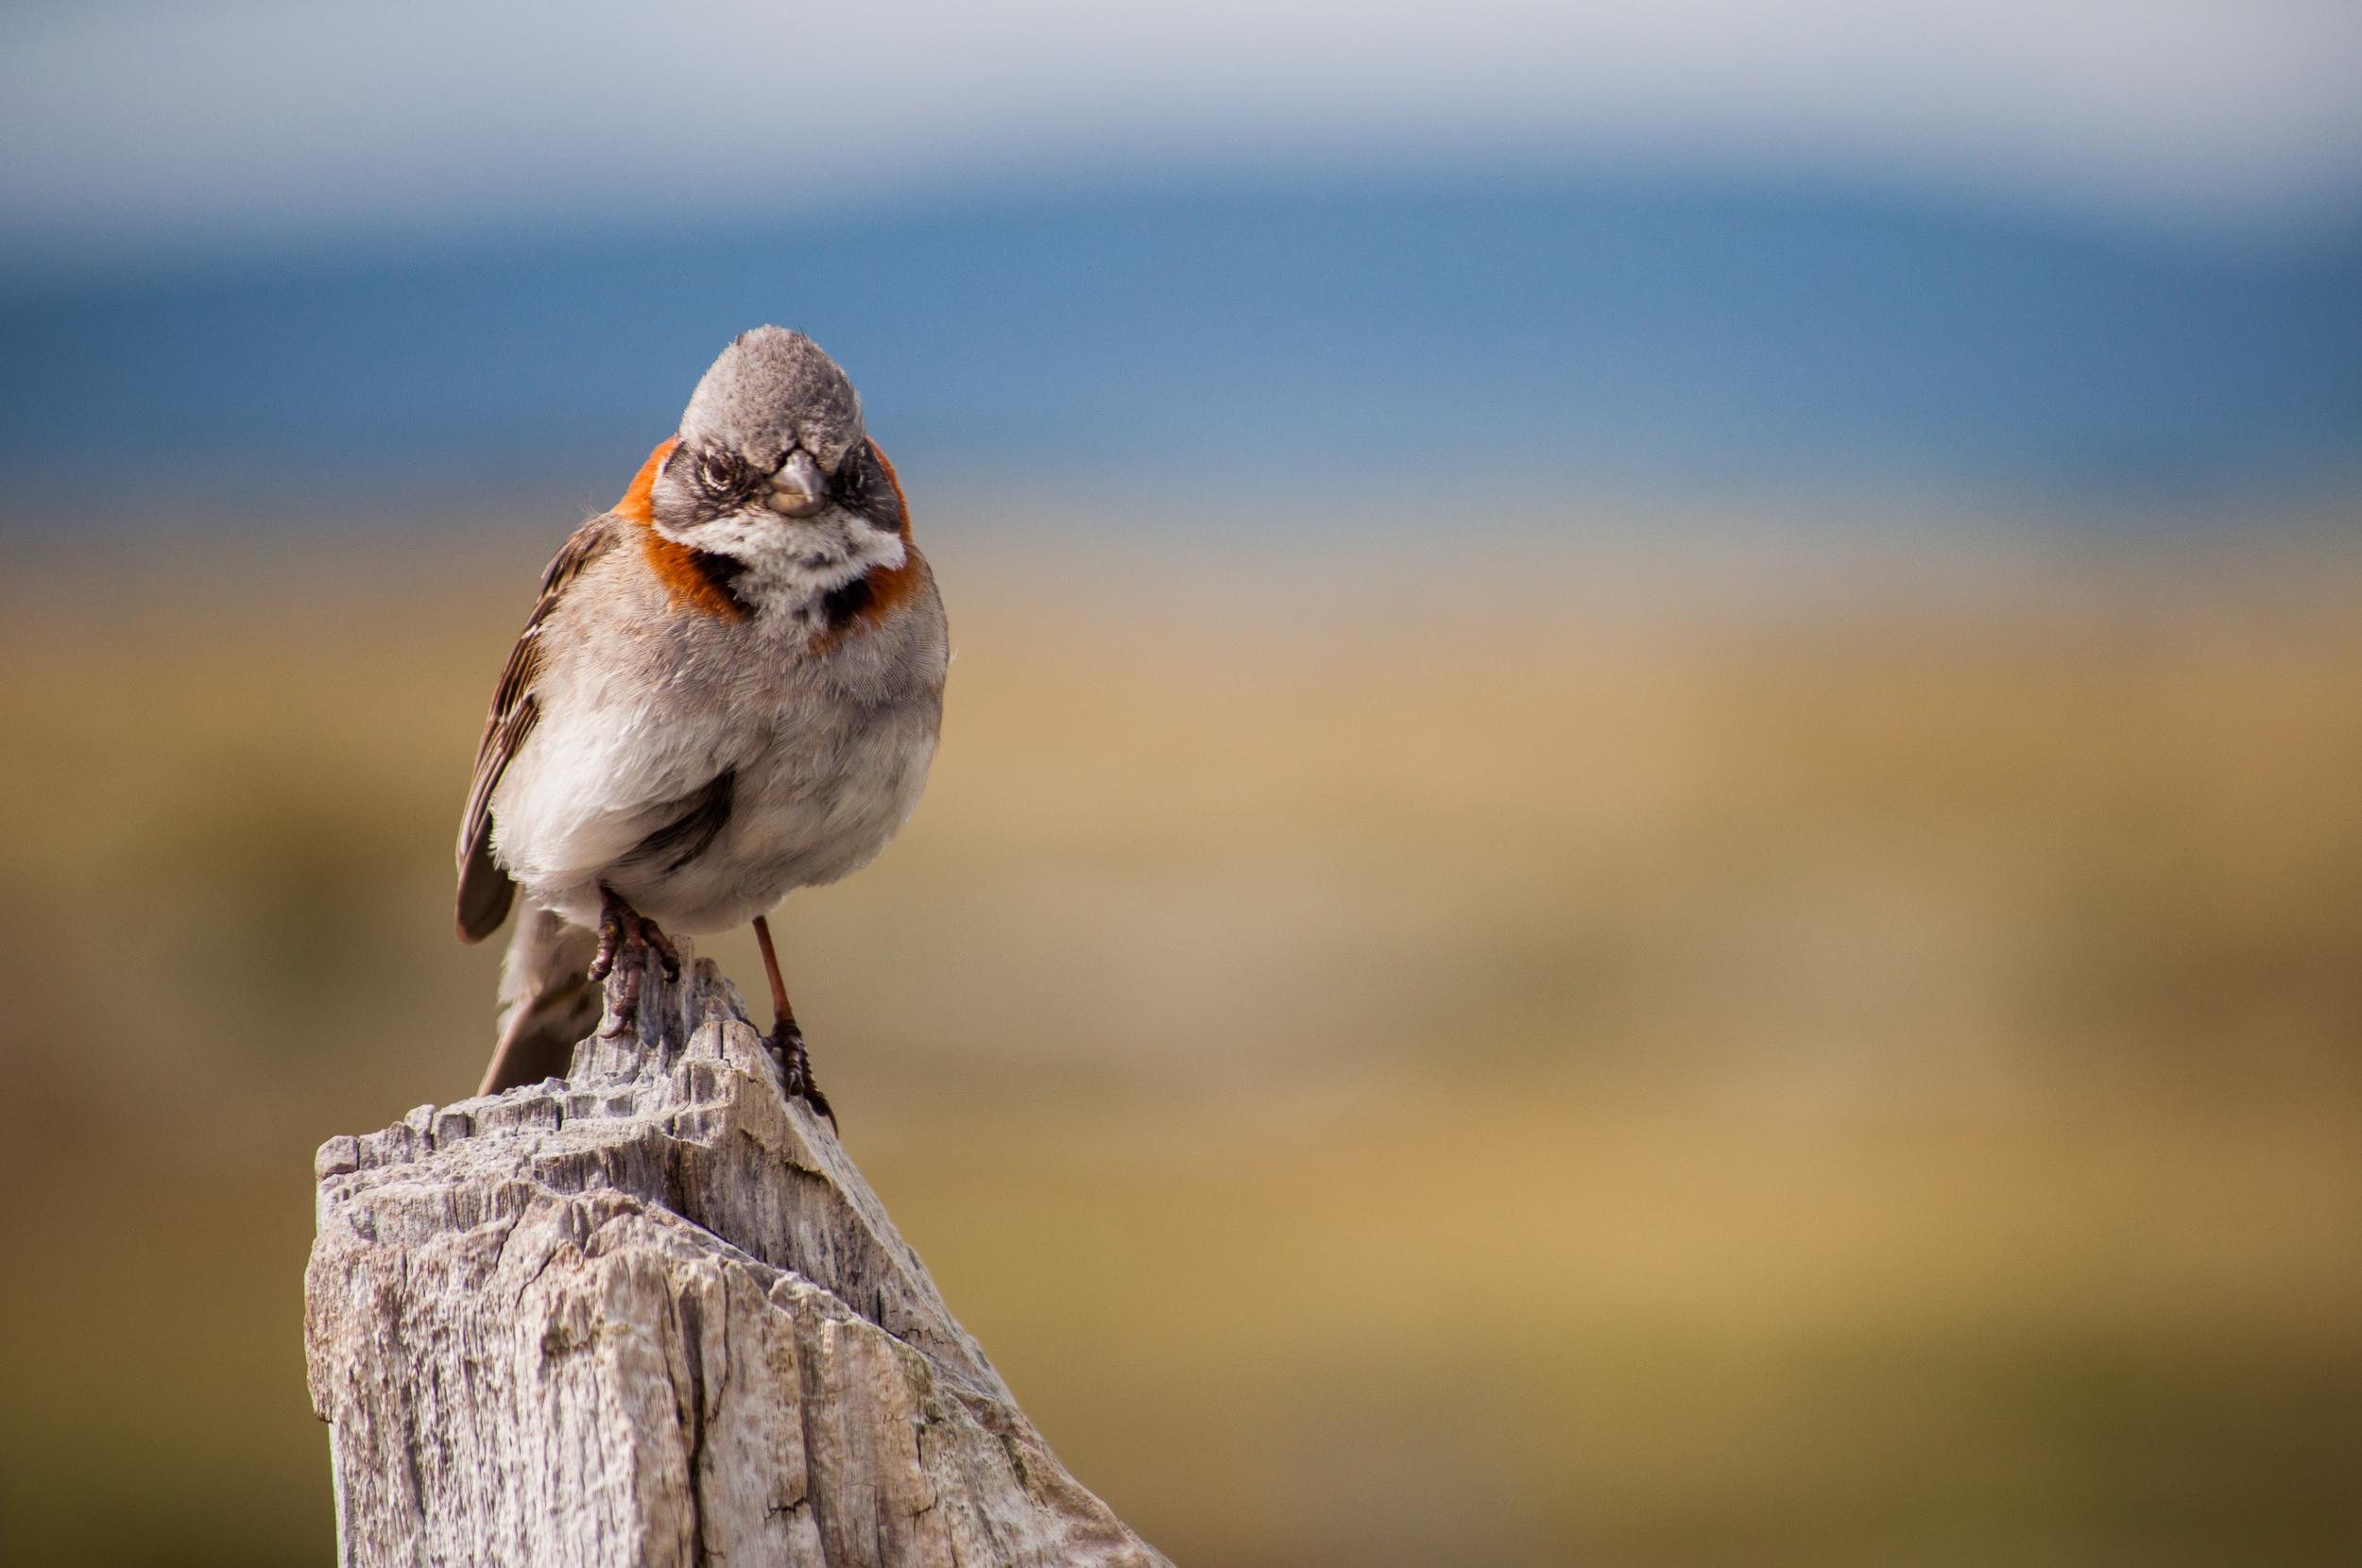 Angry Bird - Patagonia, 2012